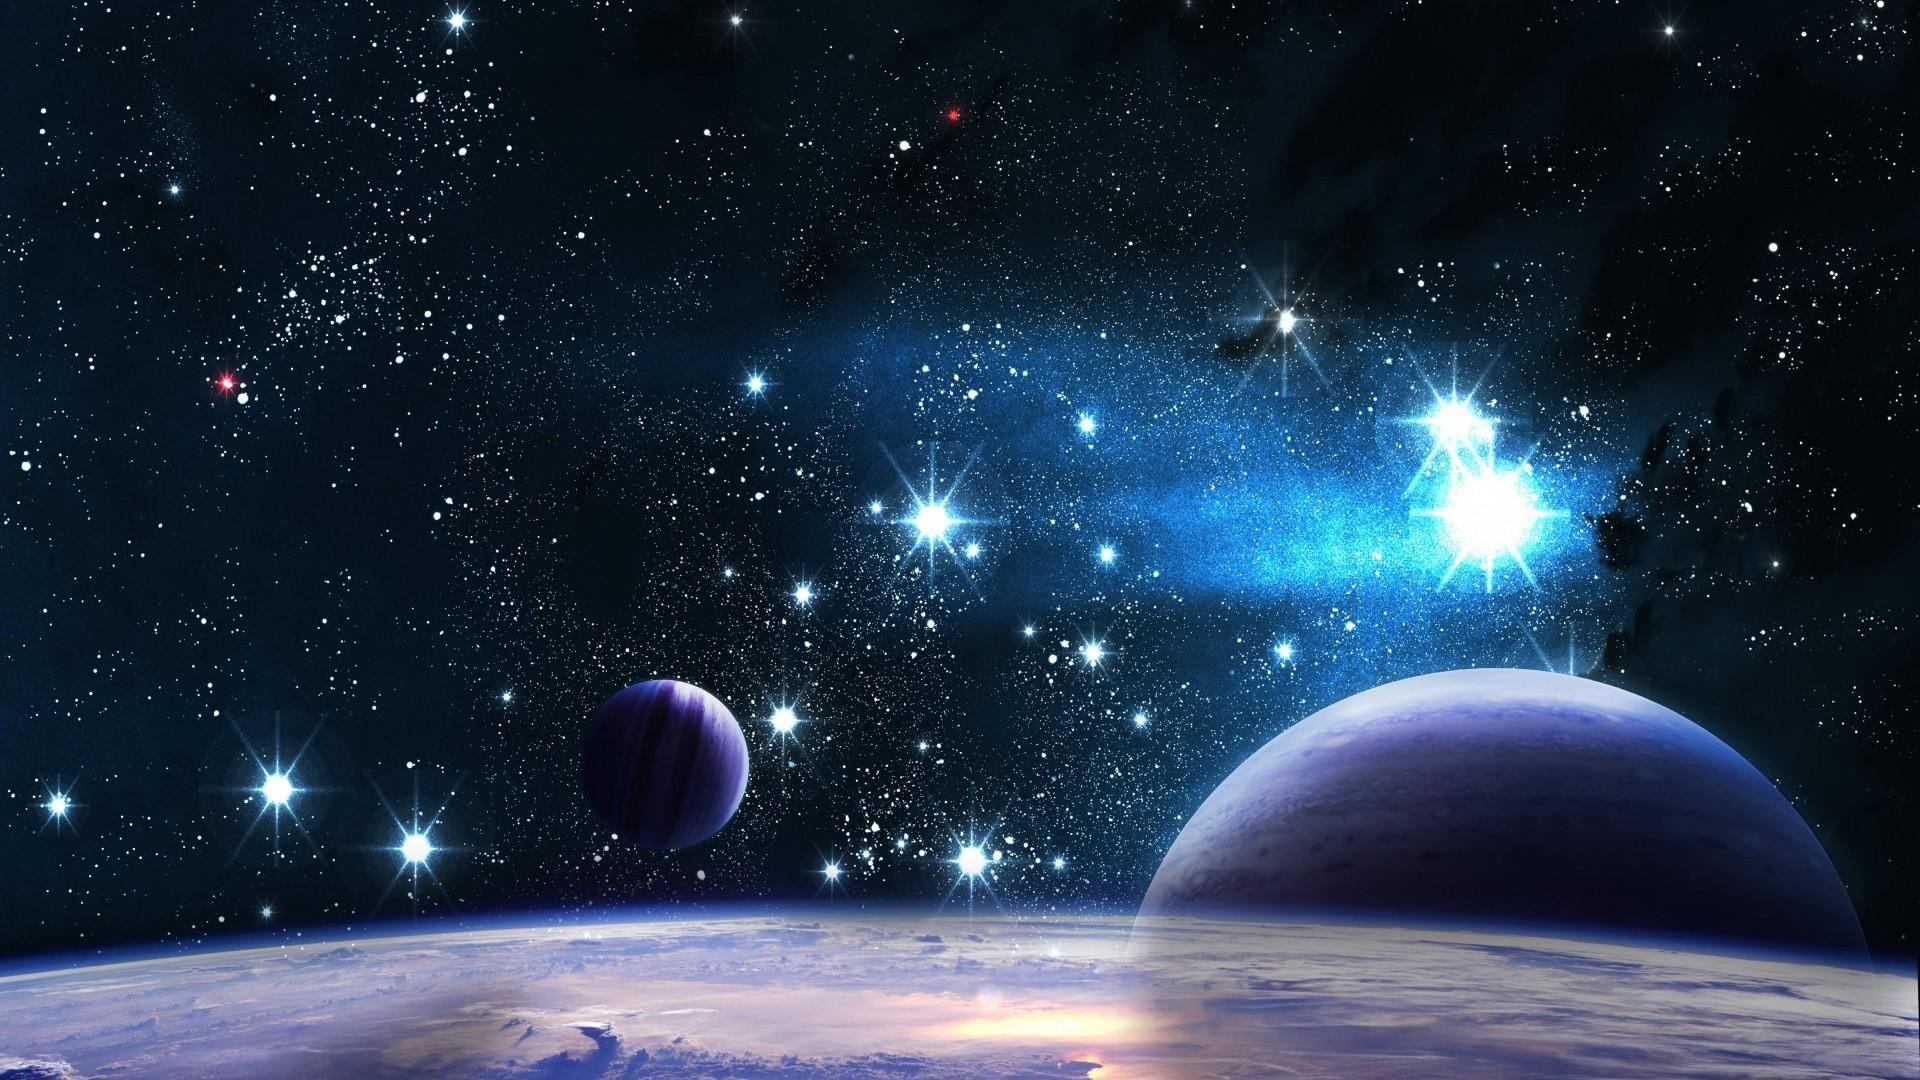 1920x1080 Art Planet Space Wallpaper 1080p Hd Real